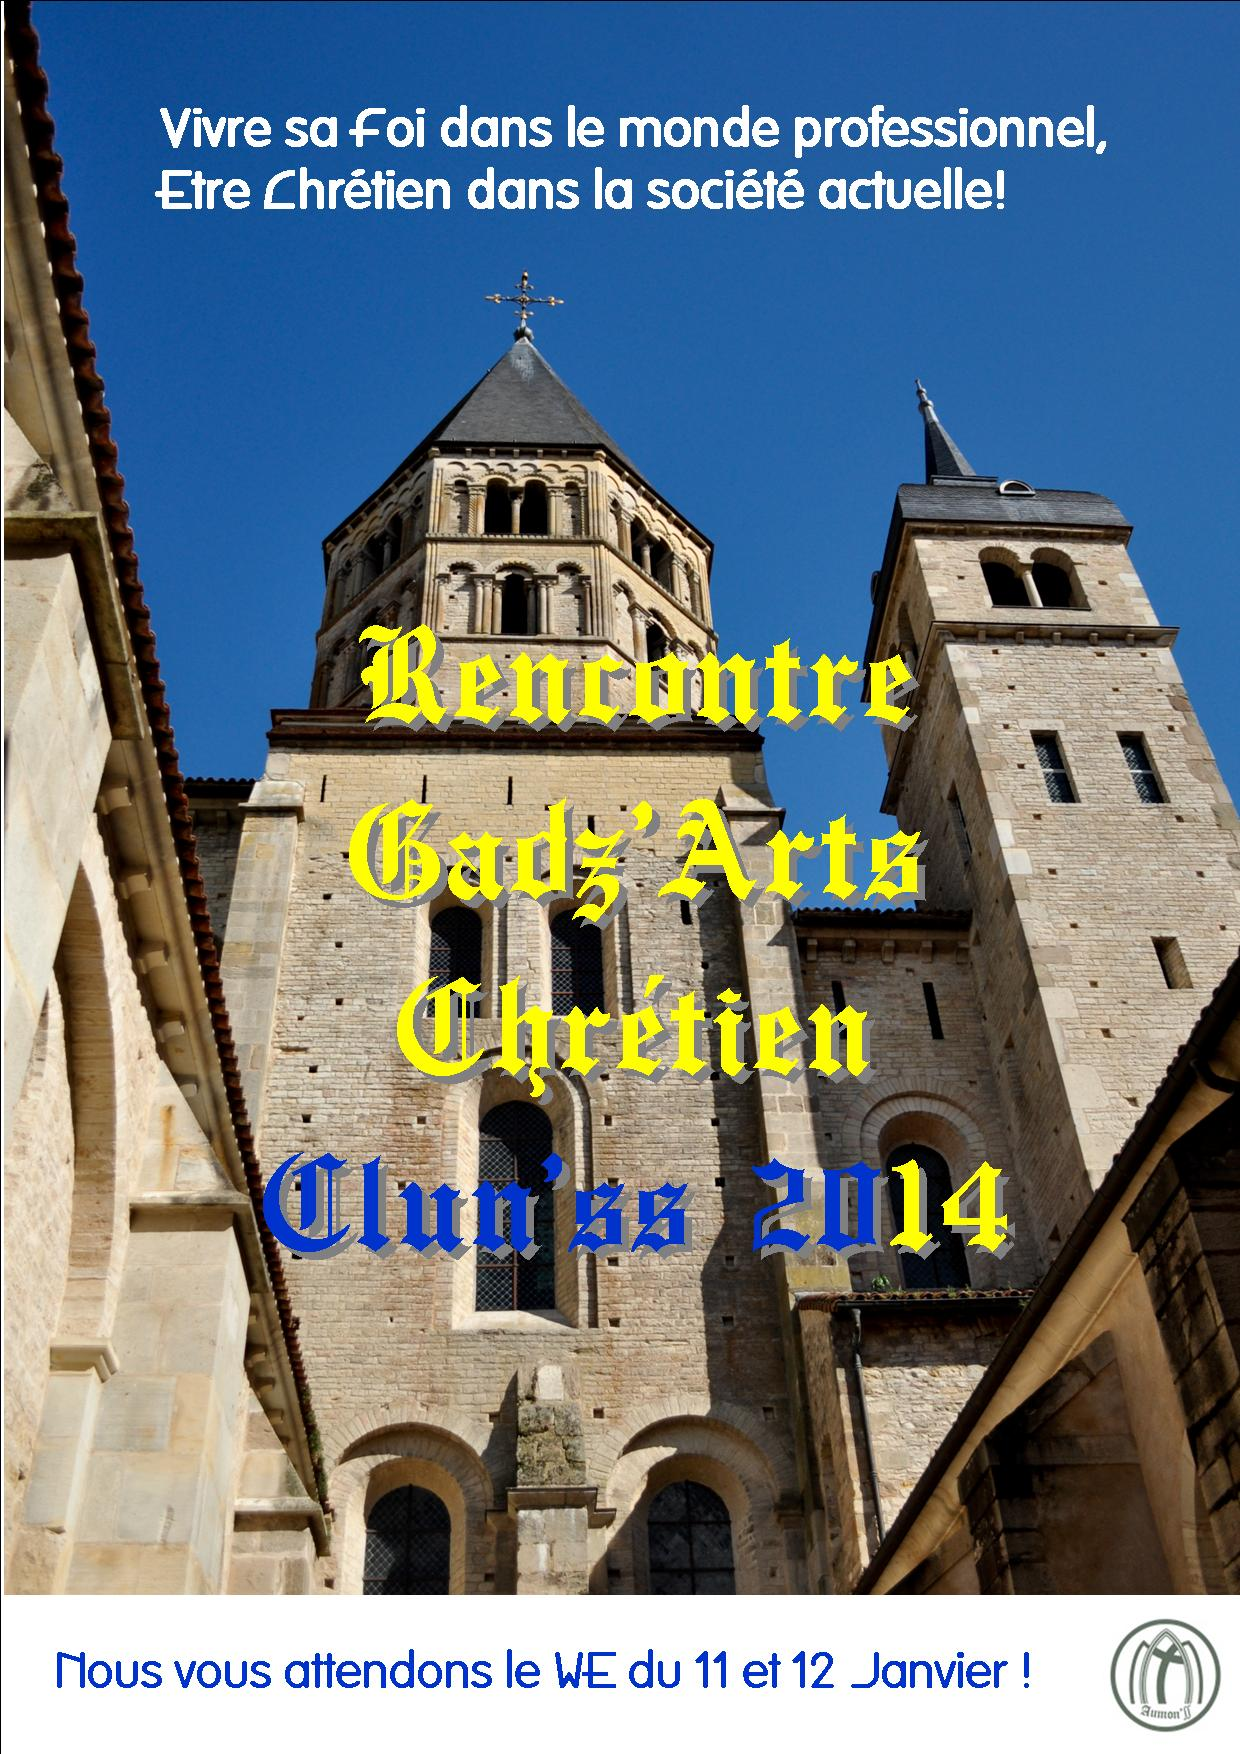 RGC Clun'ss 2014